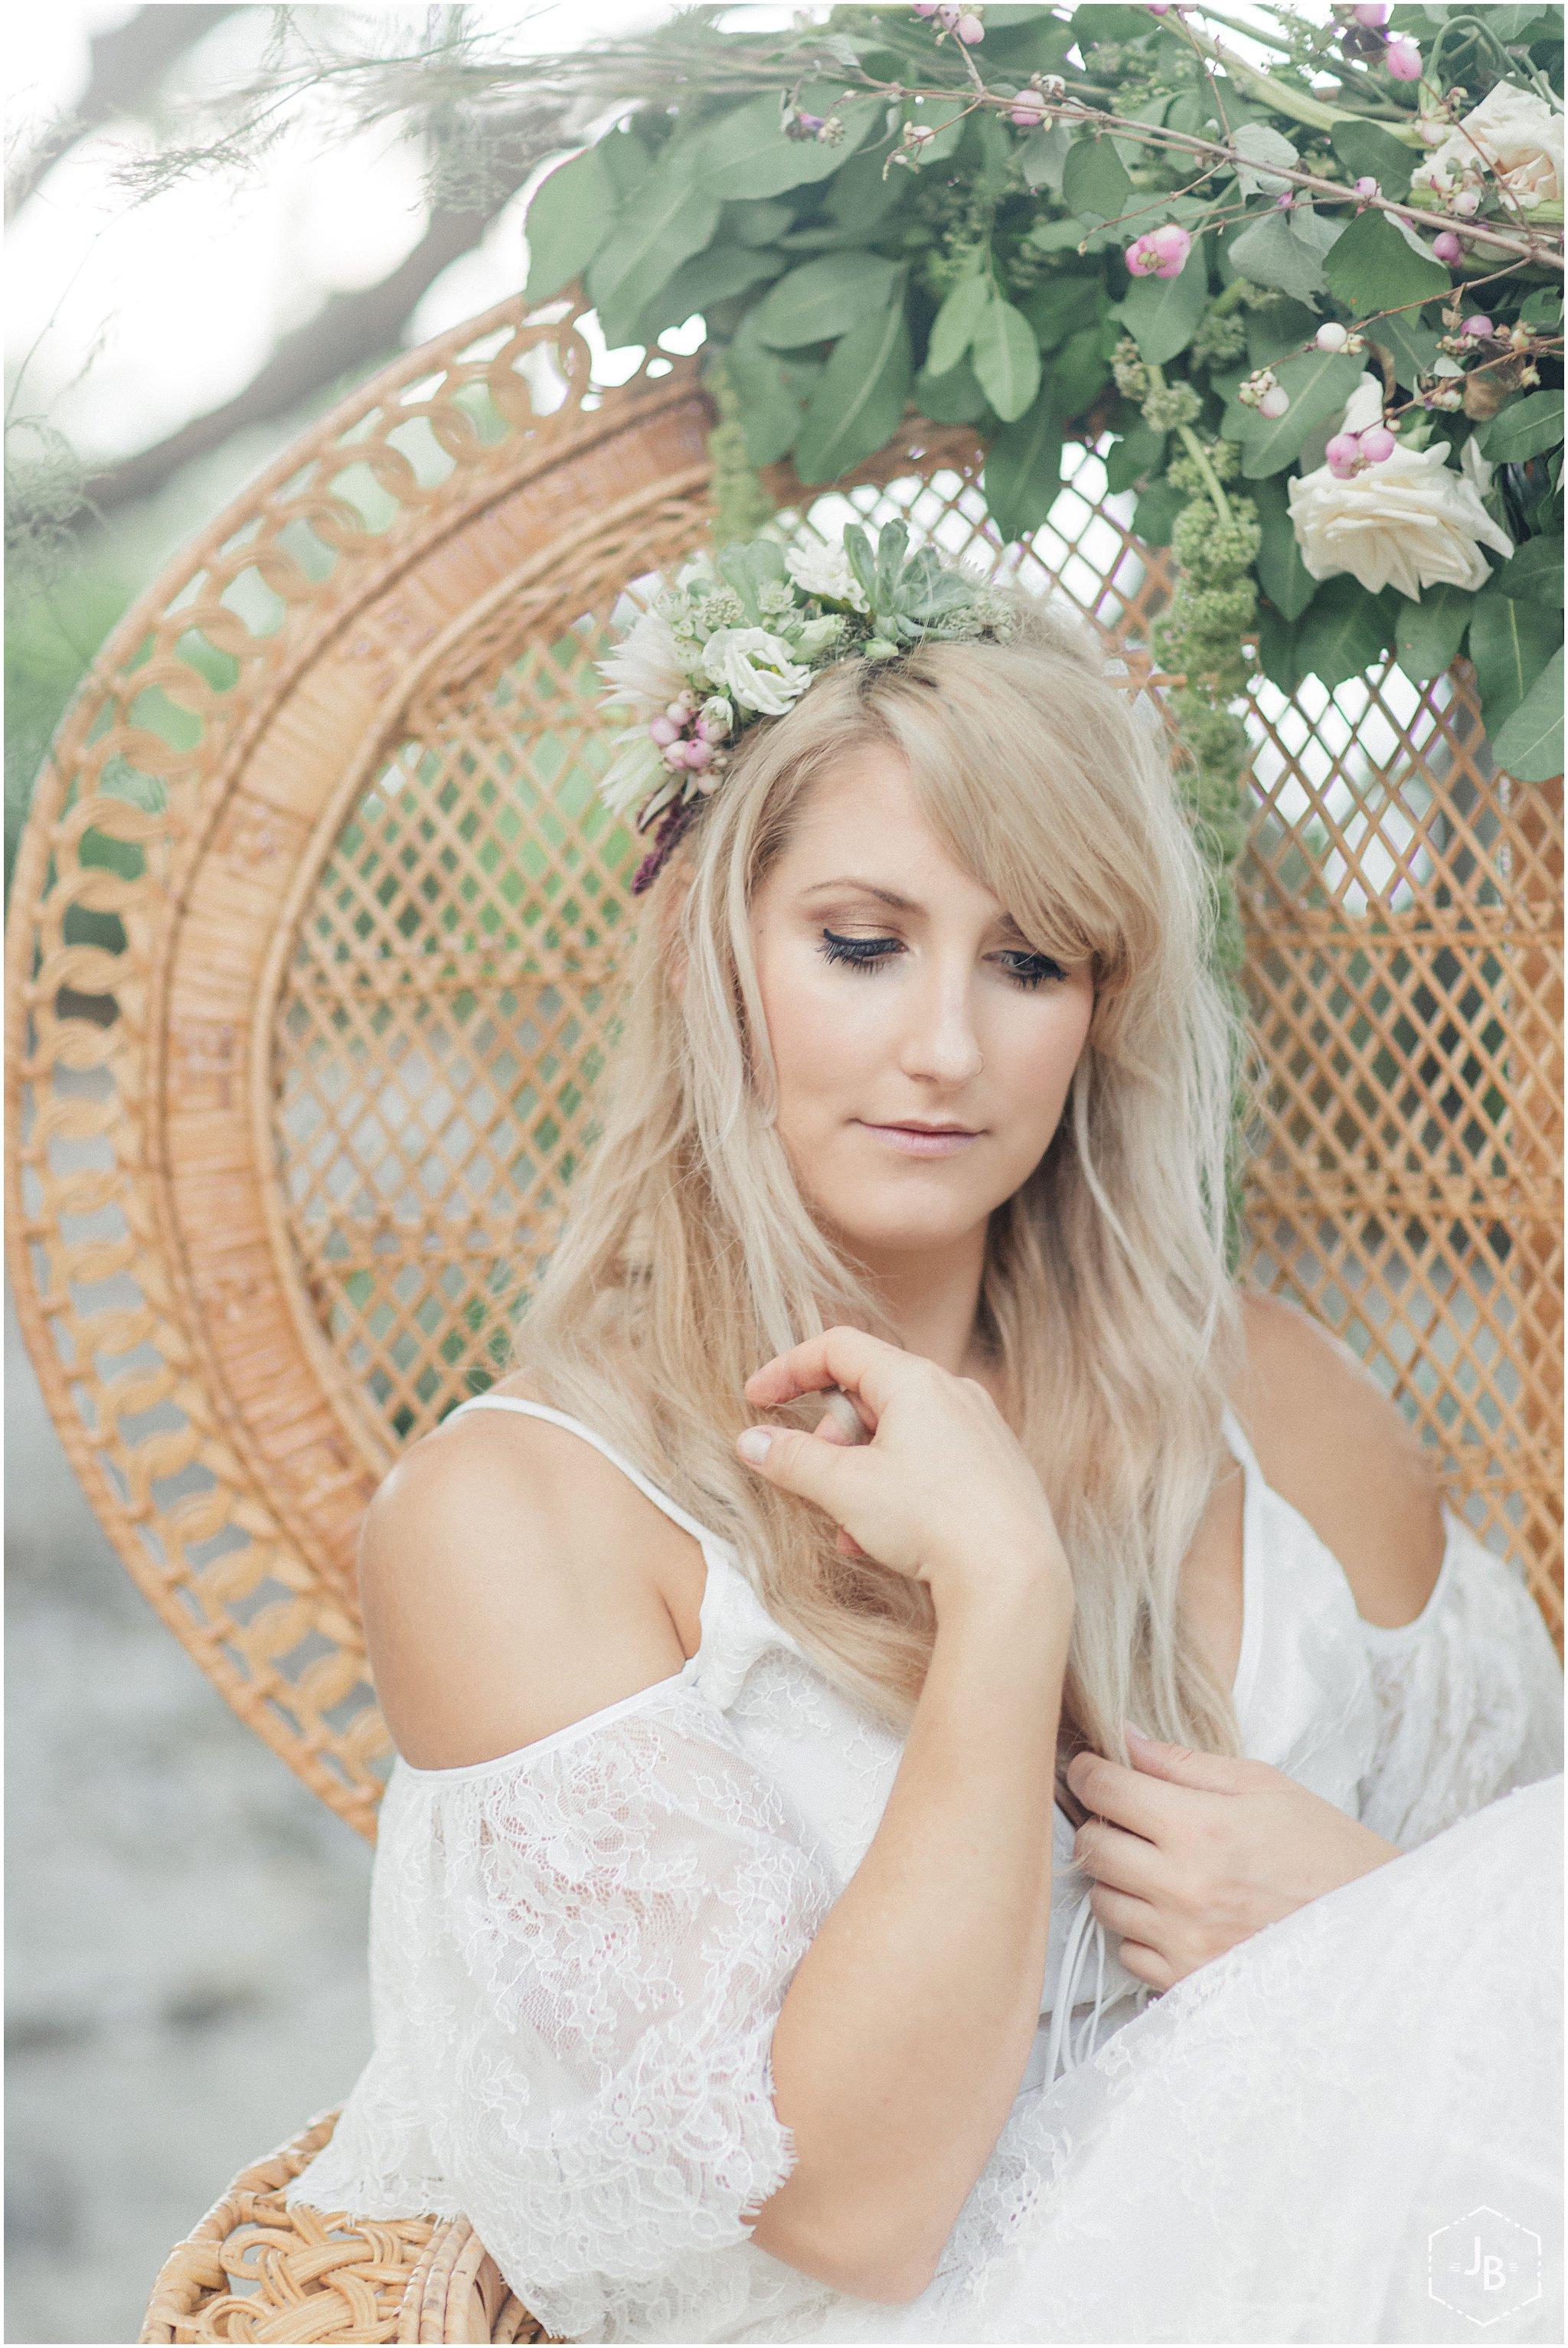 WeddingandEngagementFloridaPhotographer_1368.jpg